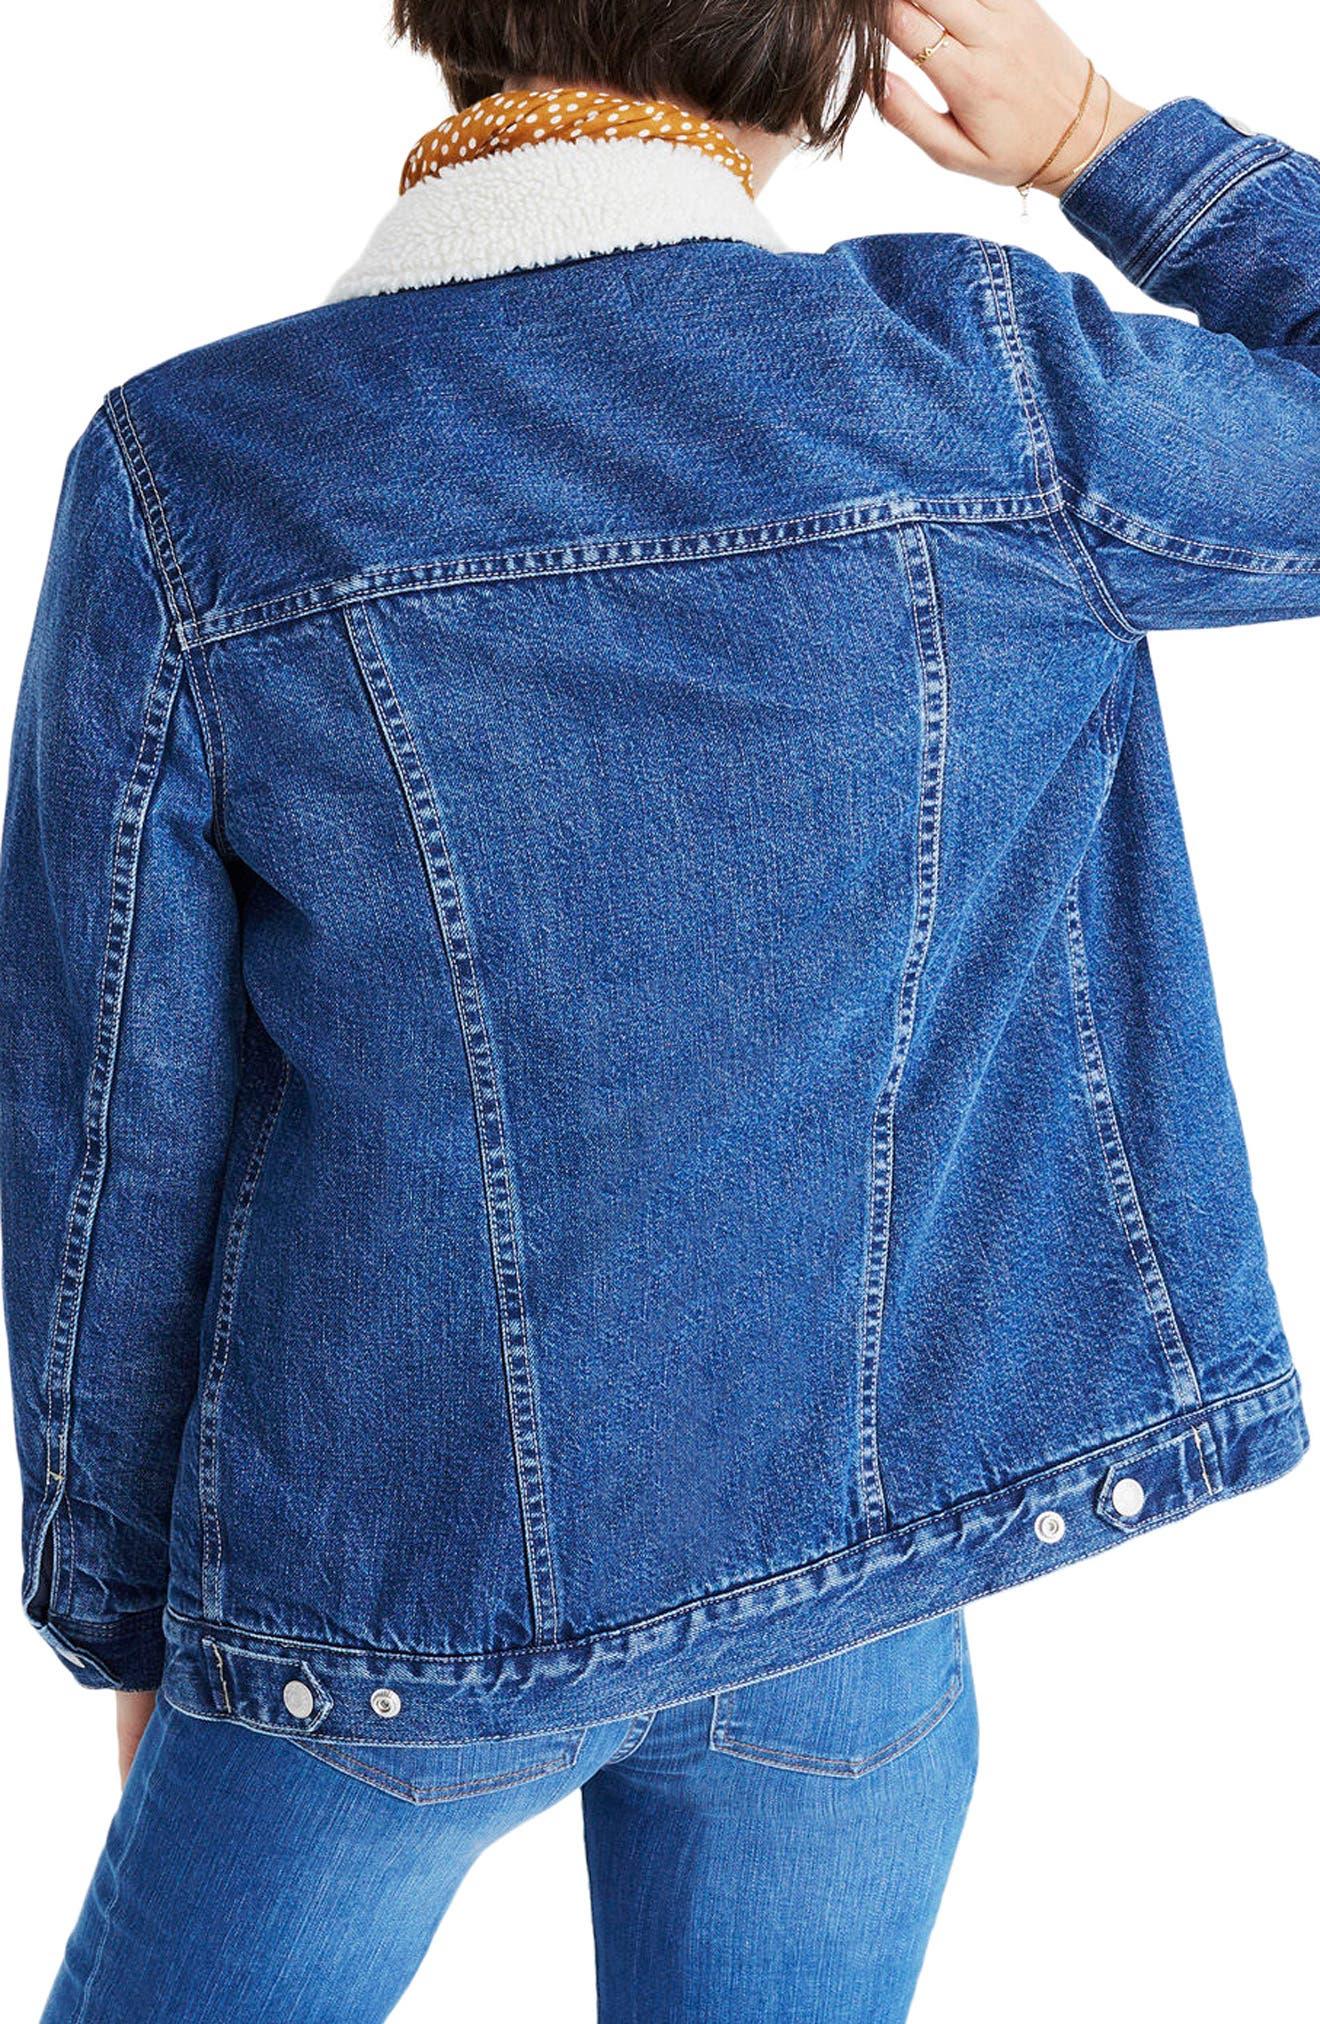 Oversize Jean Jacket,                             Alternate thumbnail 2, color,                             Montrose Wash